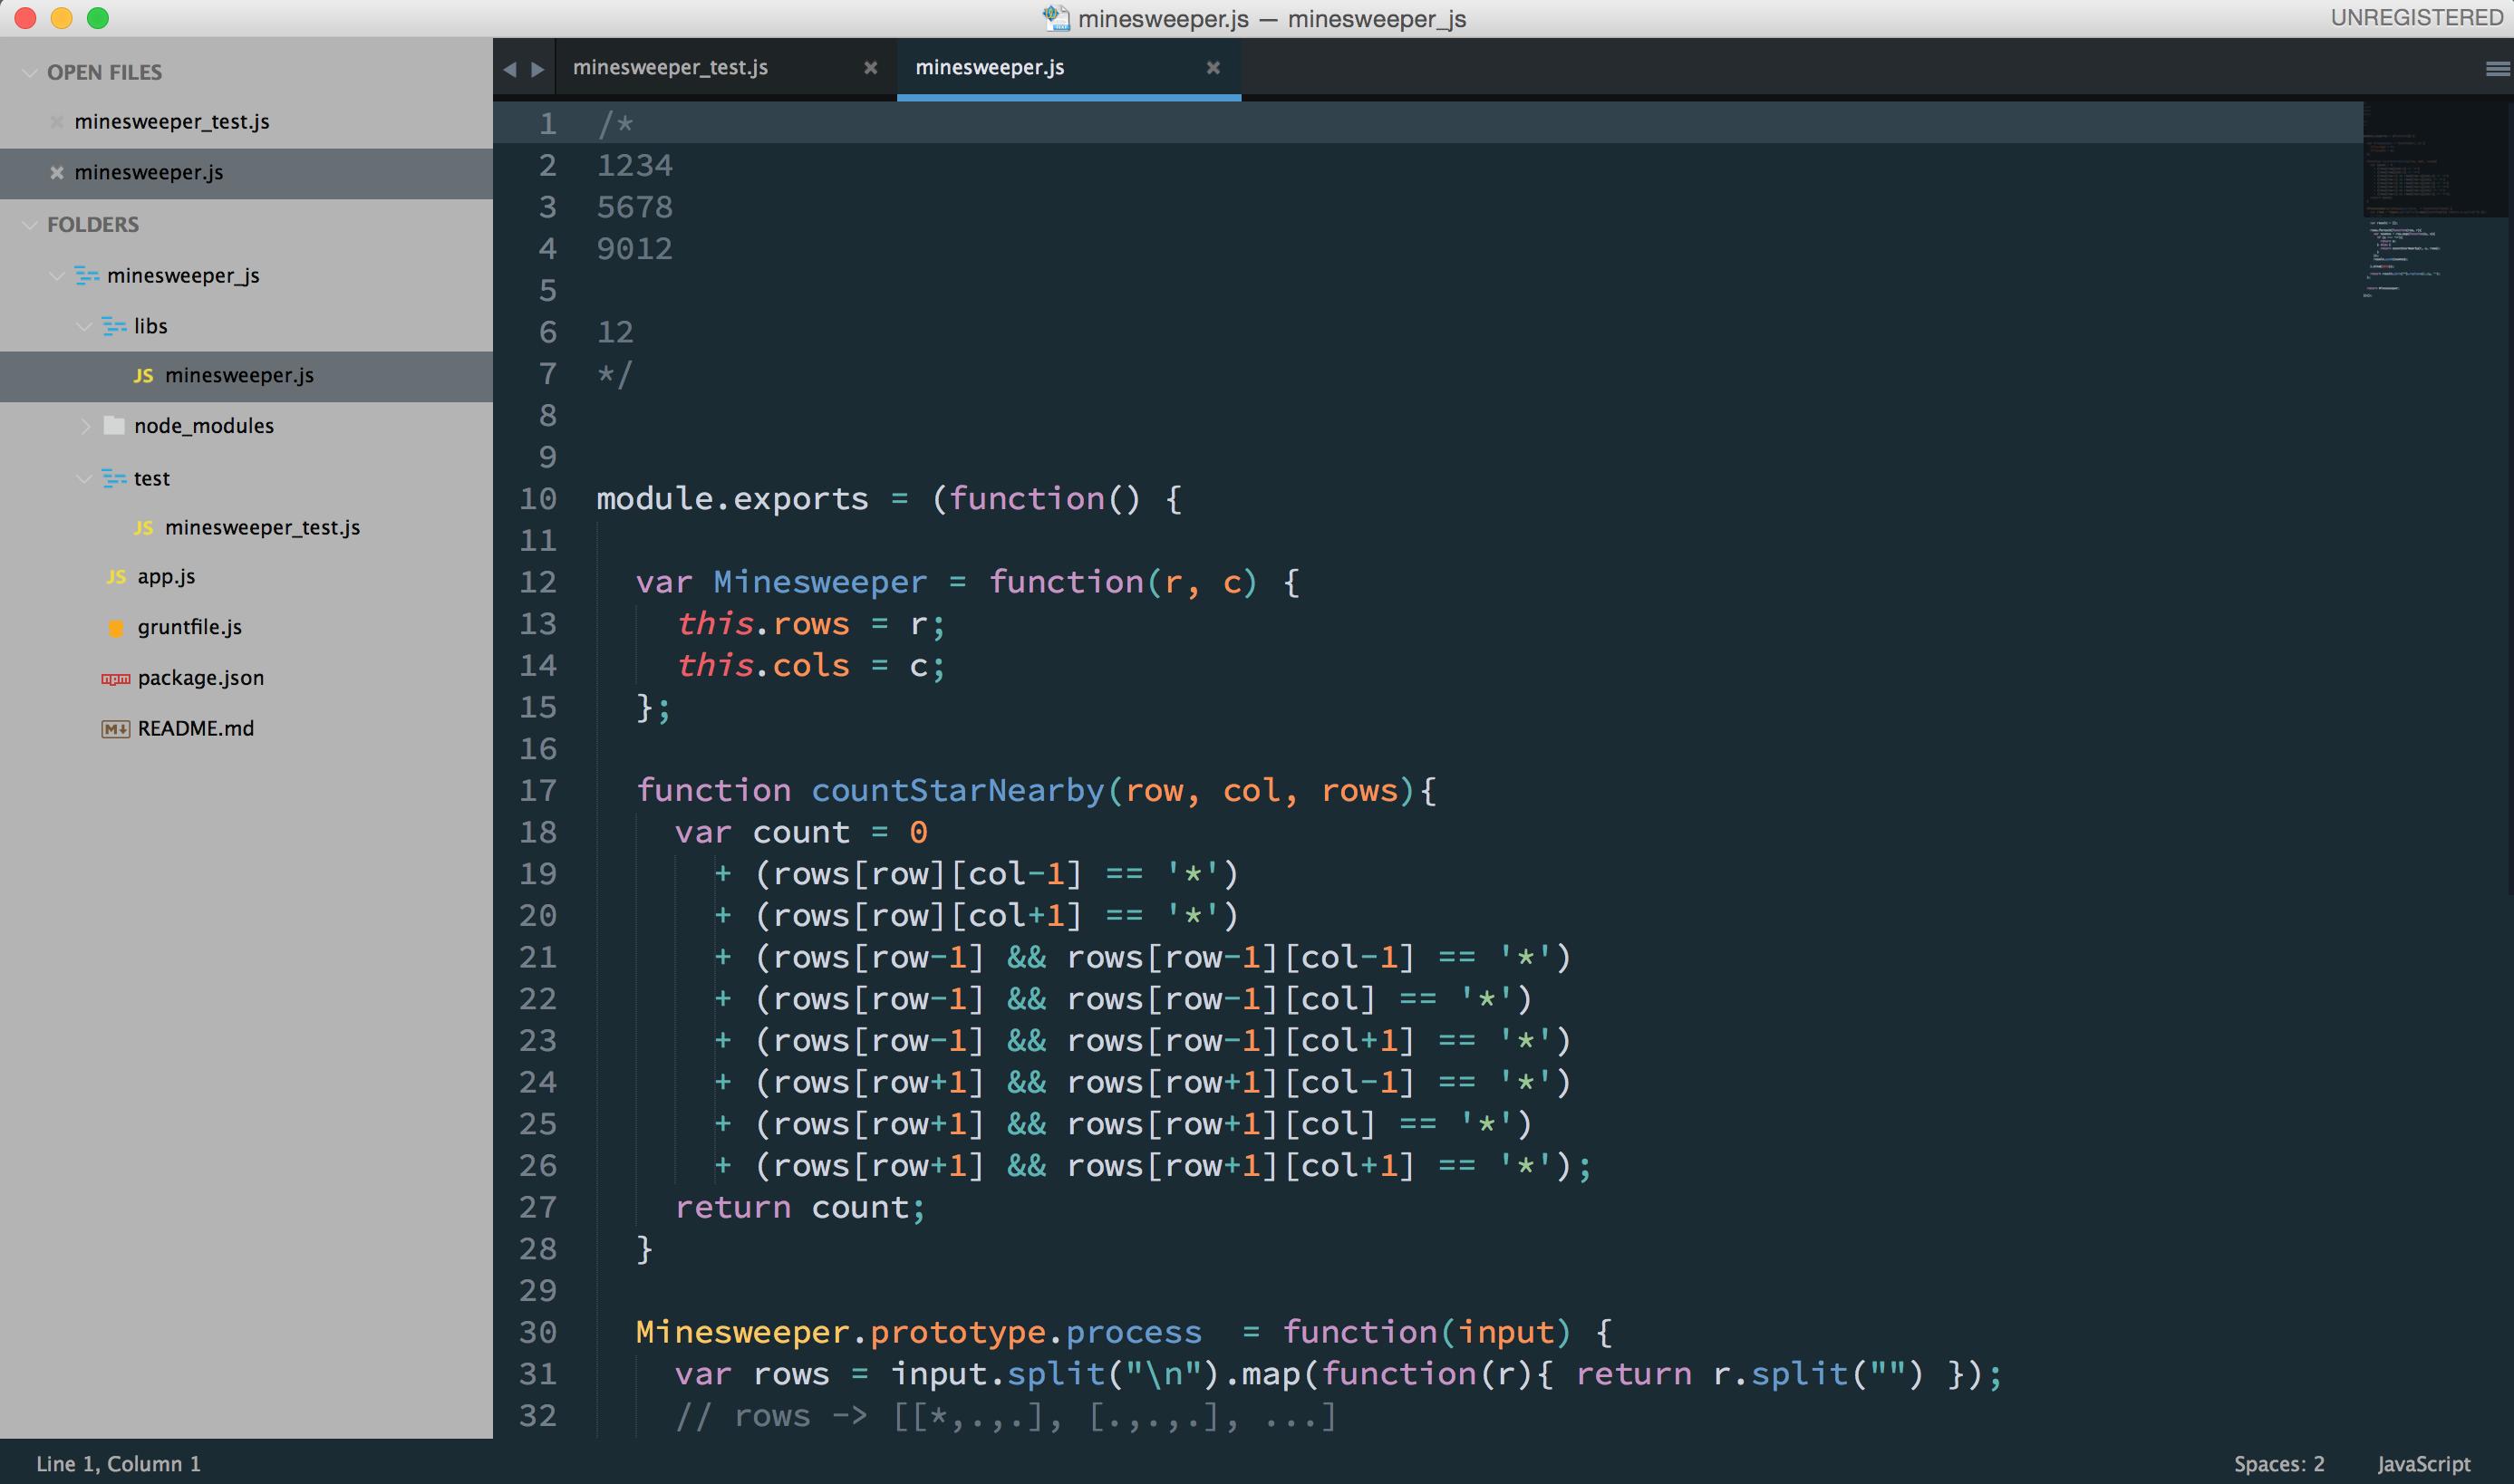 screenshot 2015-04-20 16 40 34